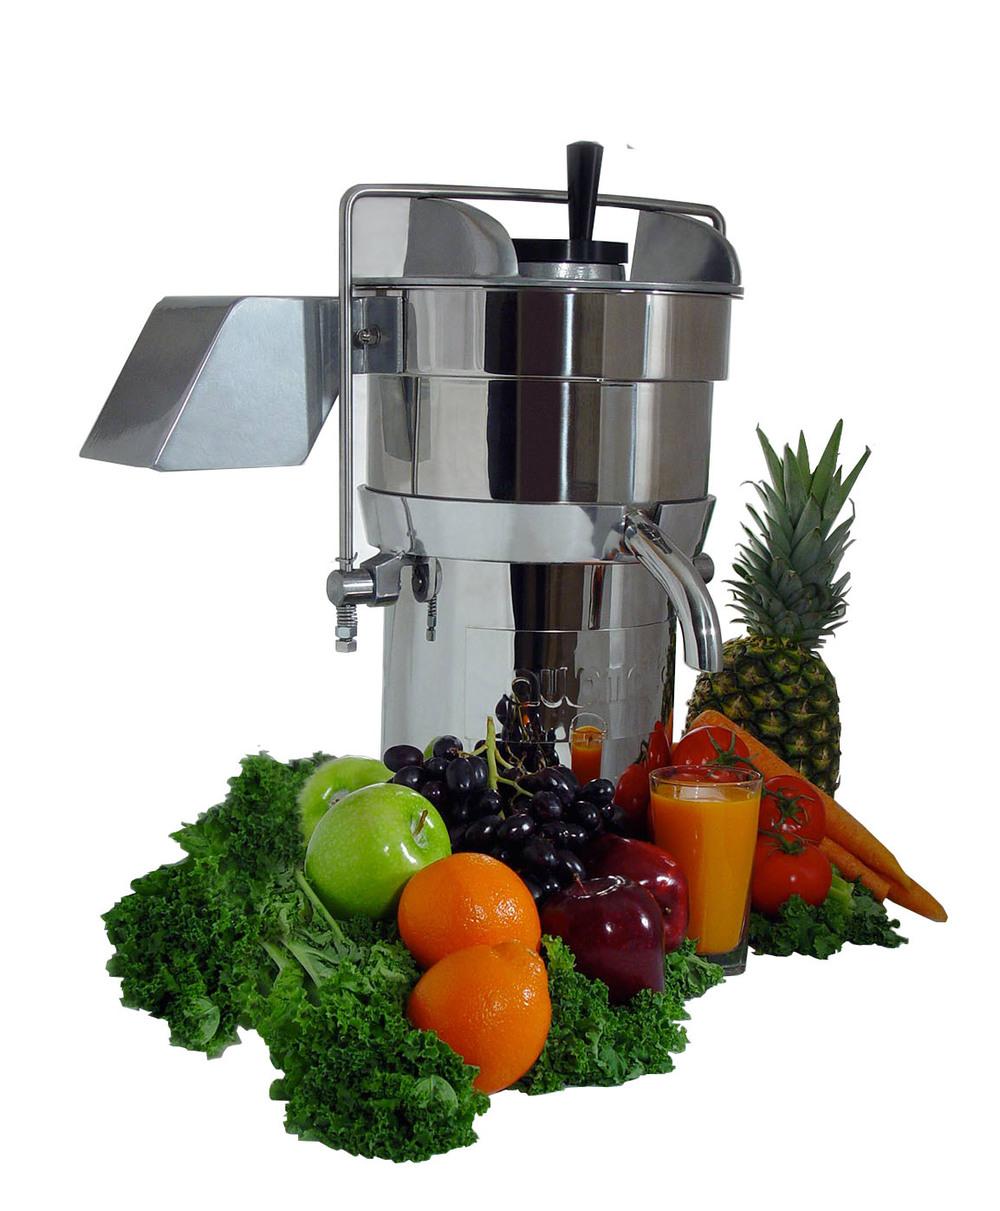 Automatic Juicer ® V8